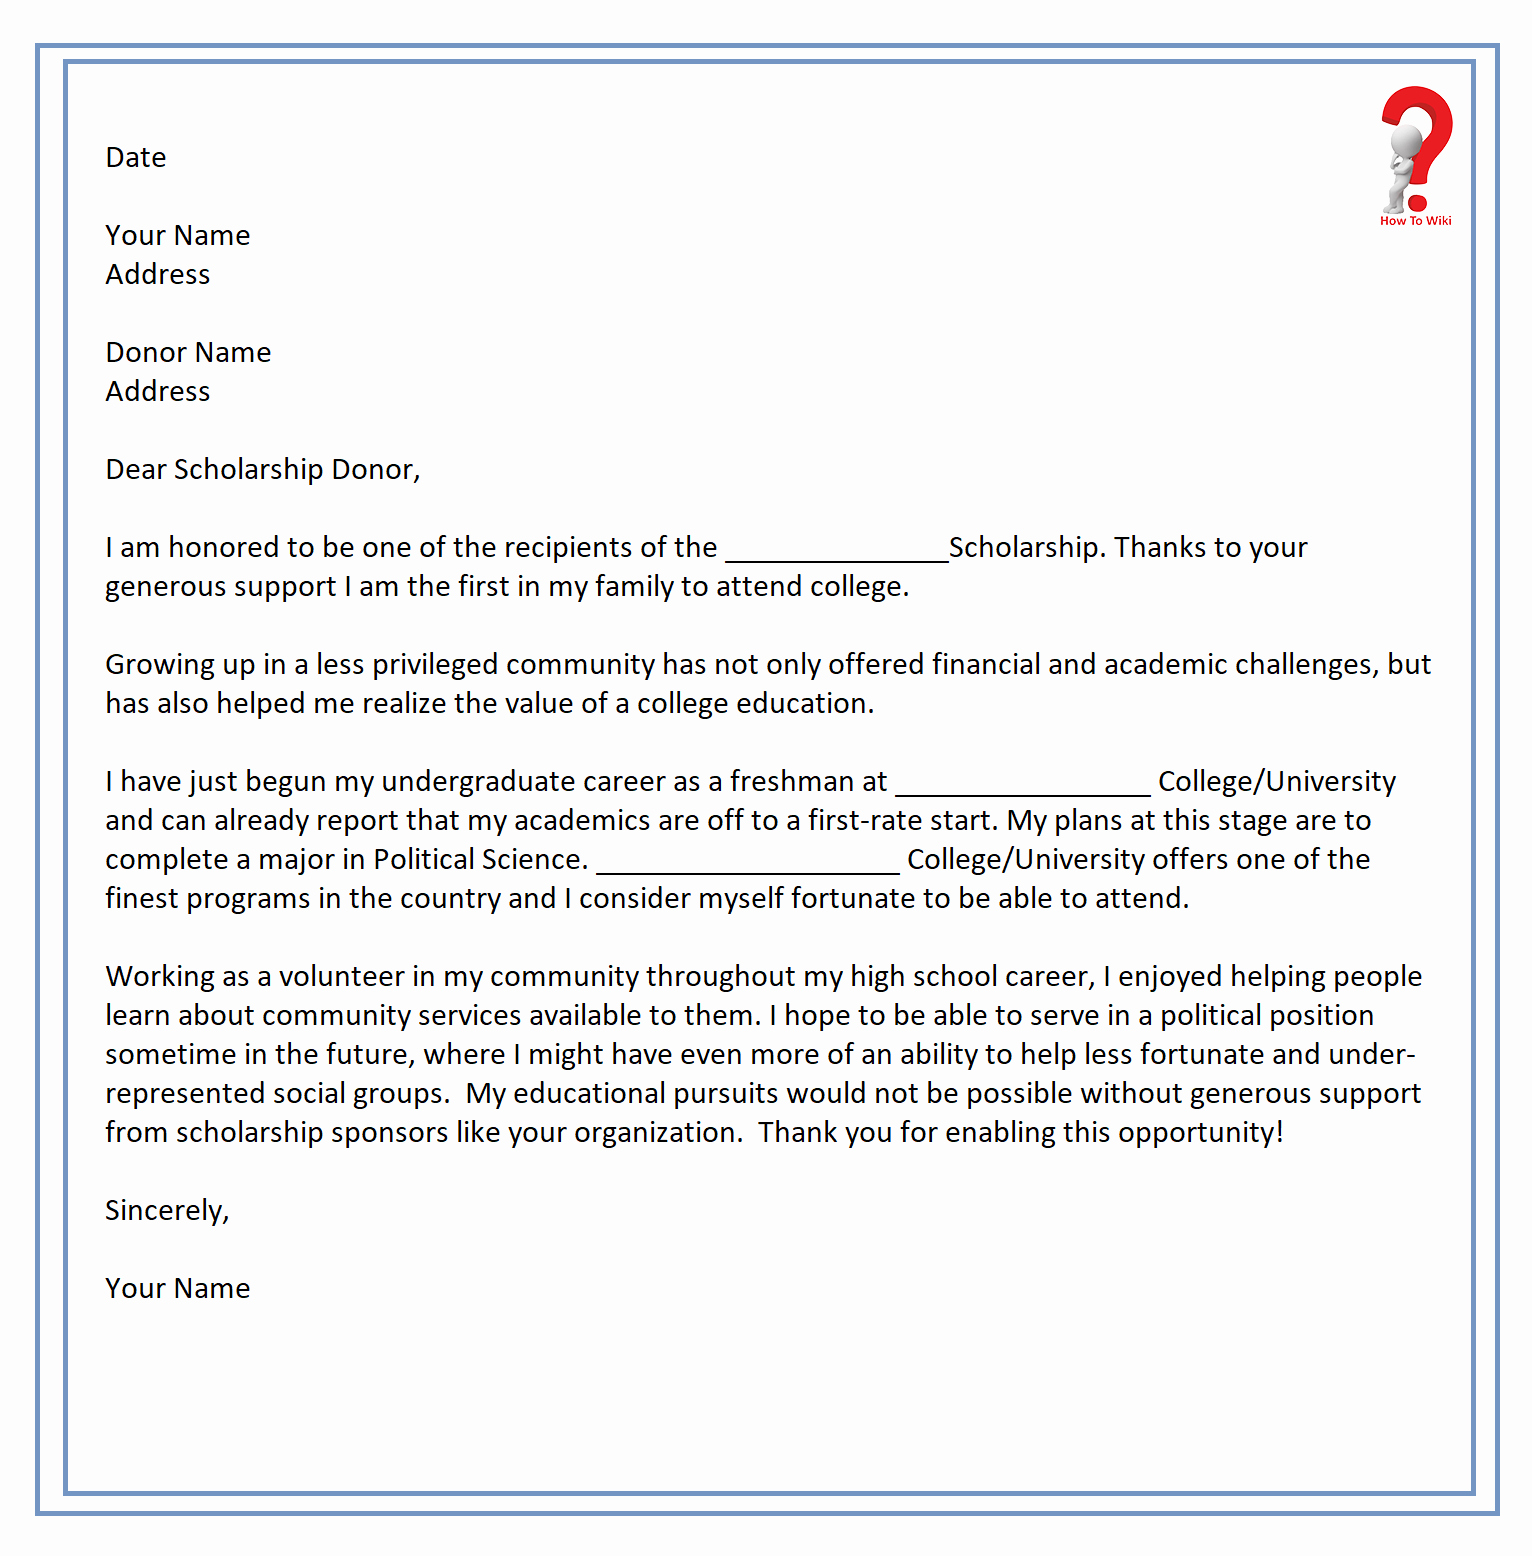 Sample Scholarship Thank You Letter Inspirational How to Write Thank You Letter for Scholarship